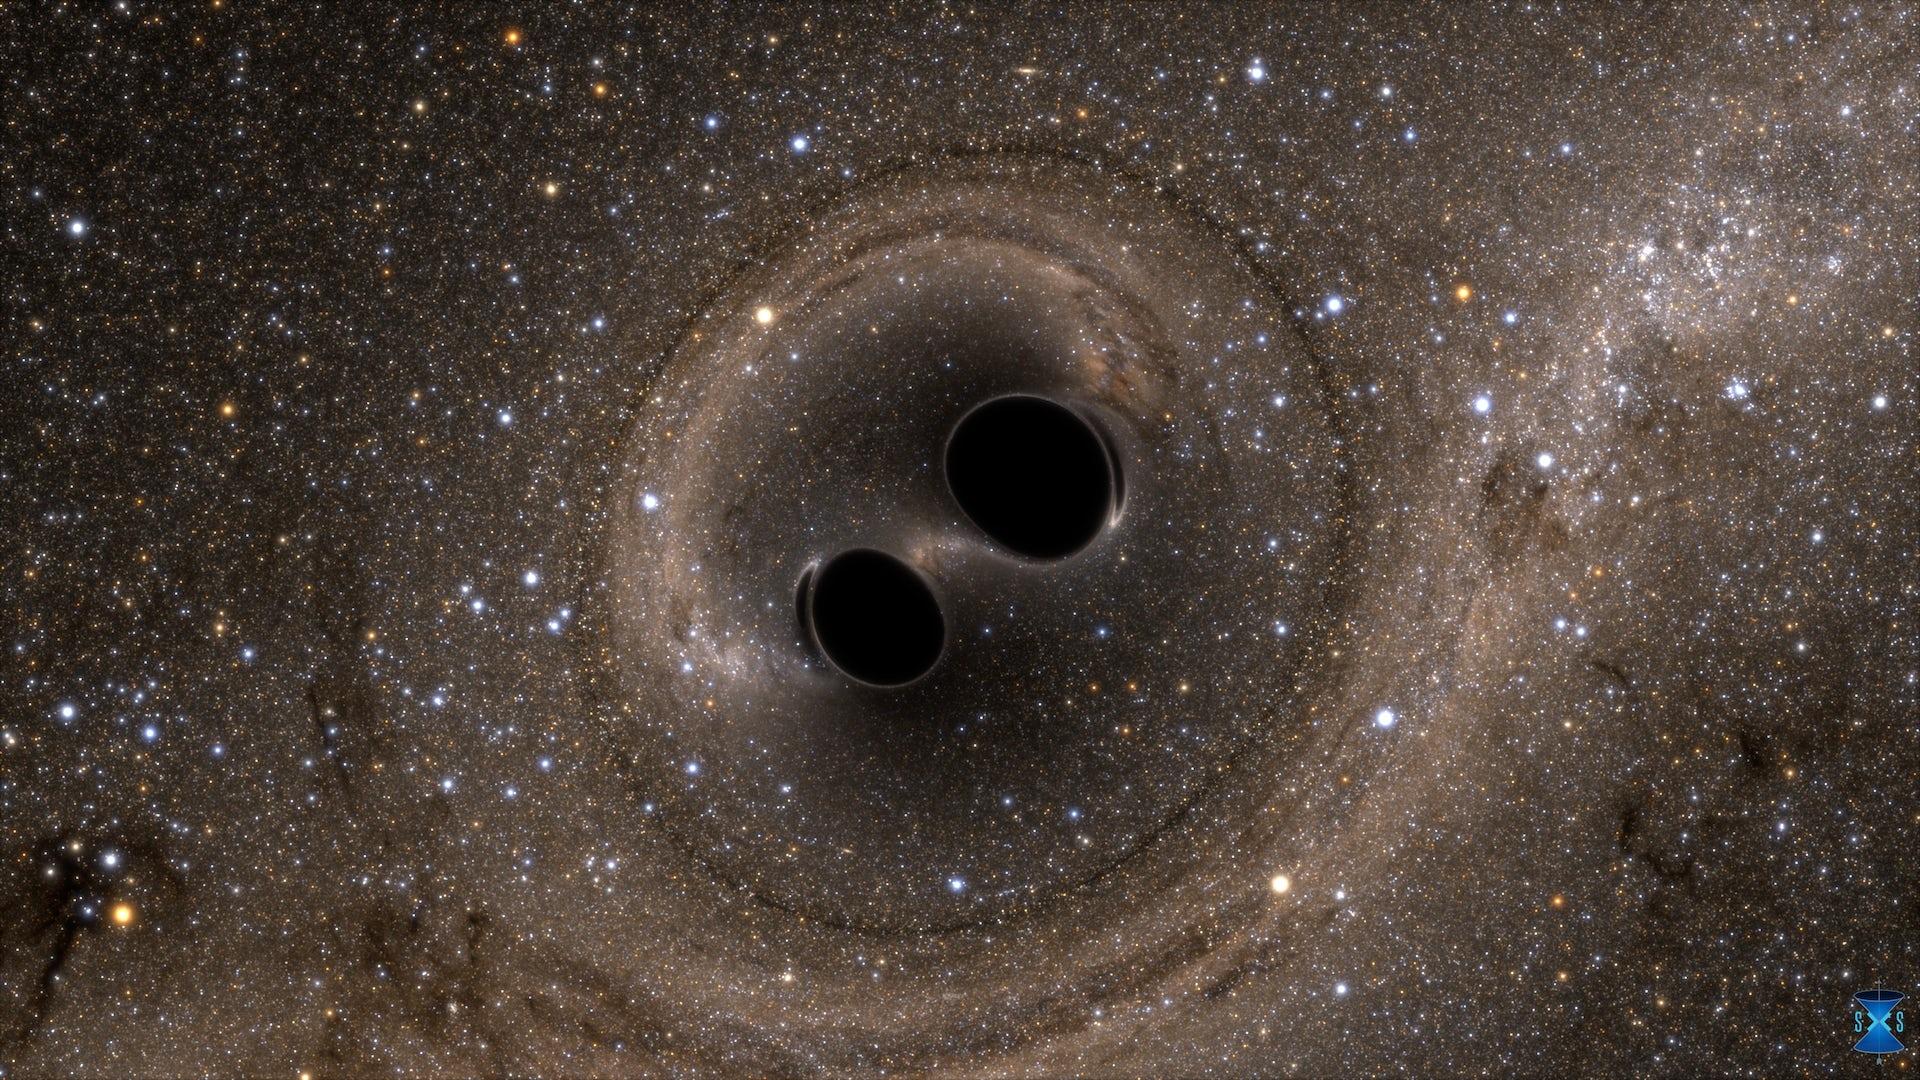 USA trio win Nobel for finding Einstein's gravitational waves